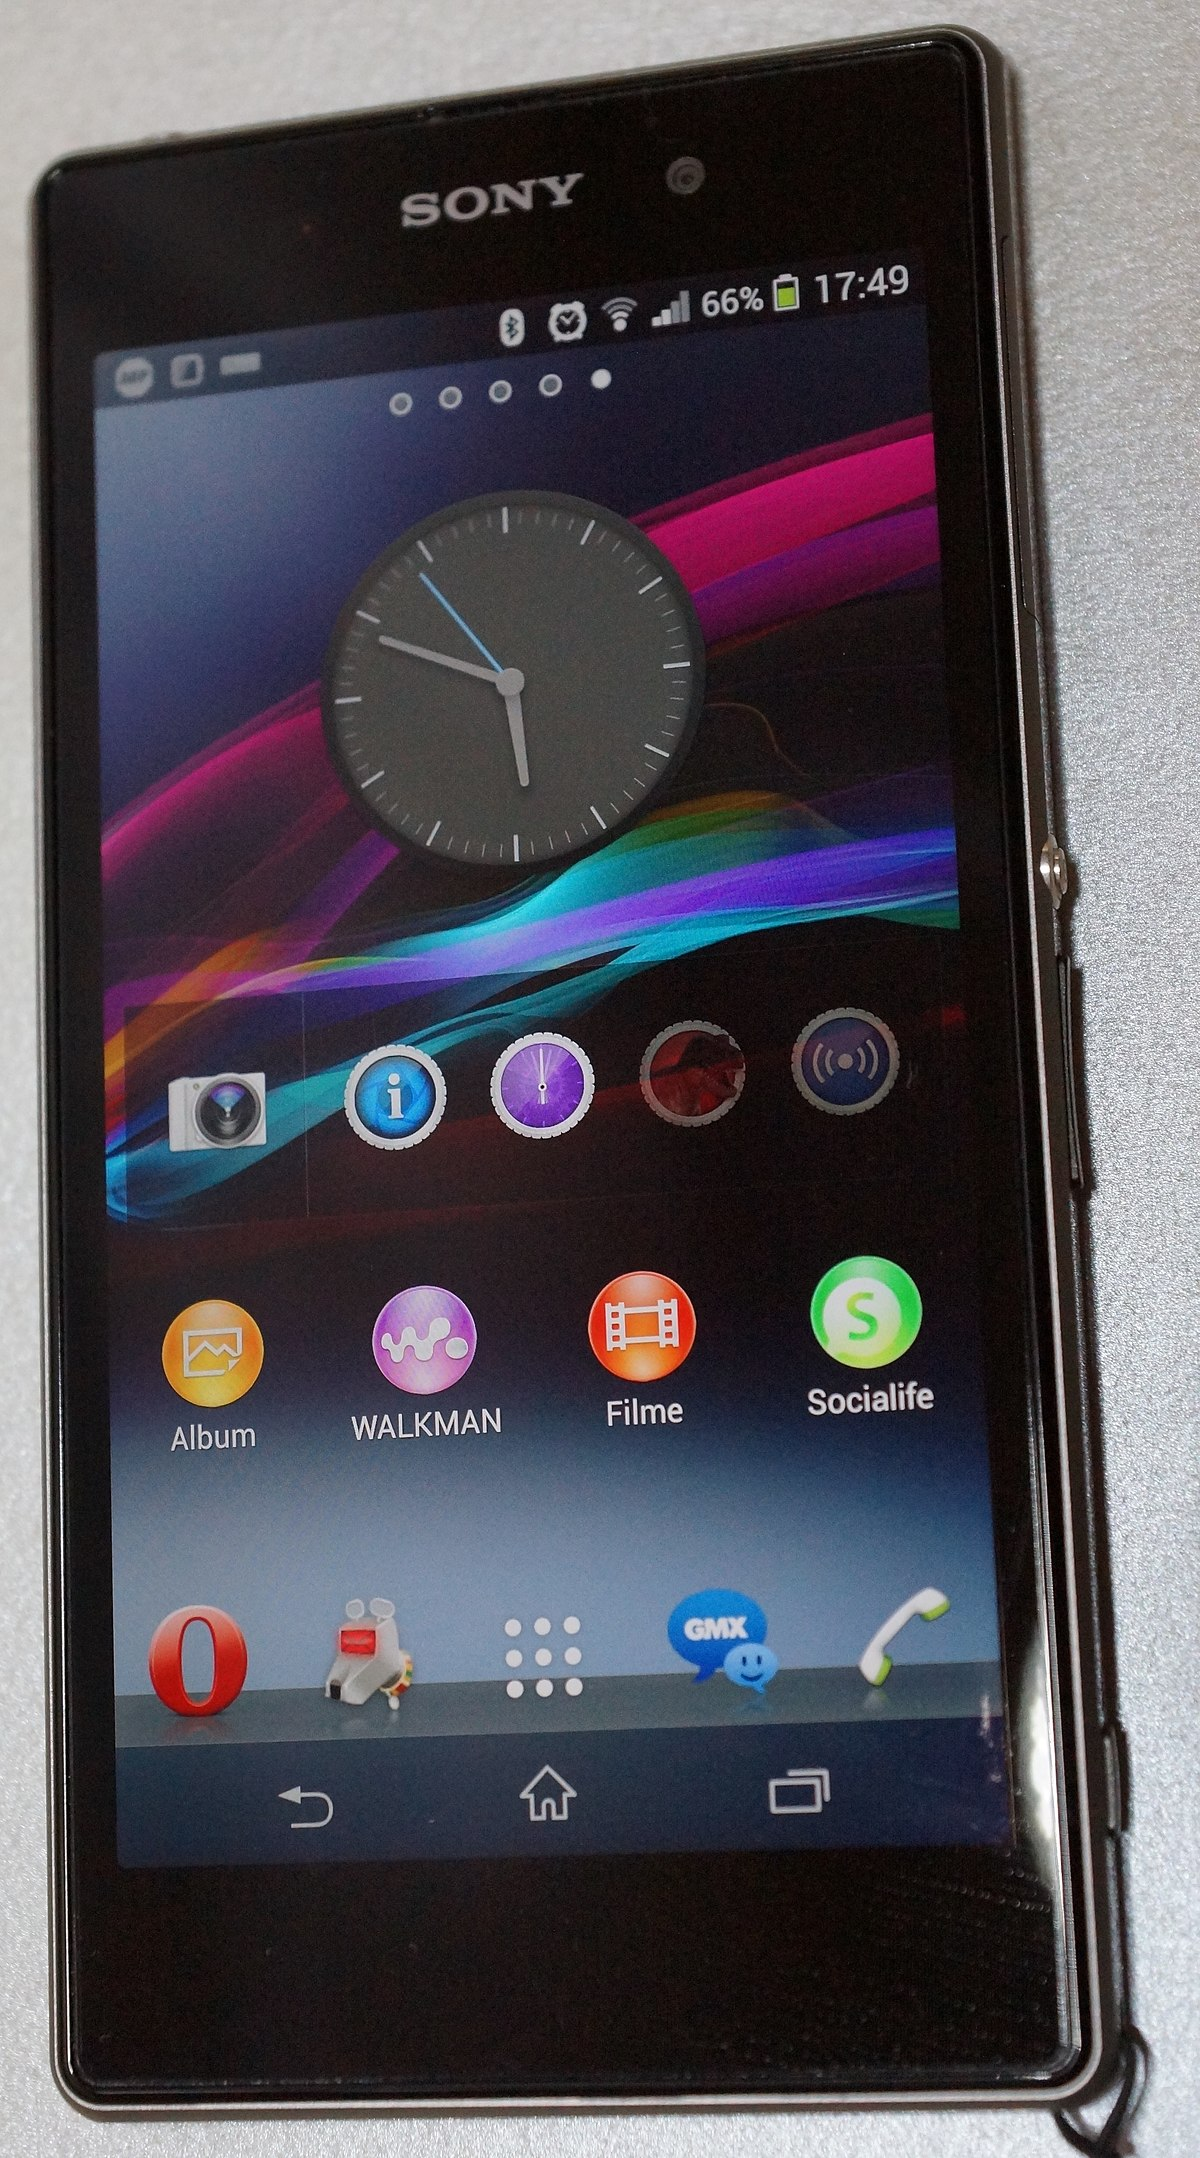 1200px Sony Xperia Z1 front view JPG